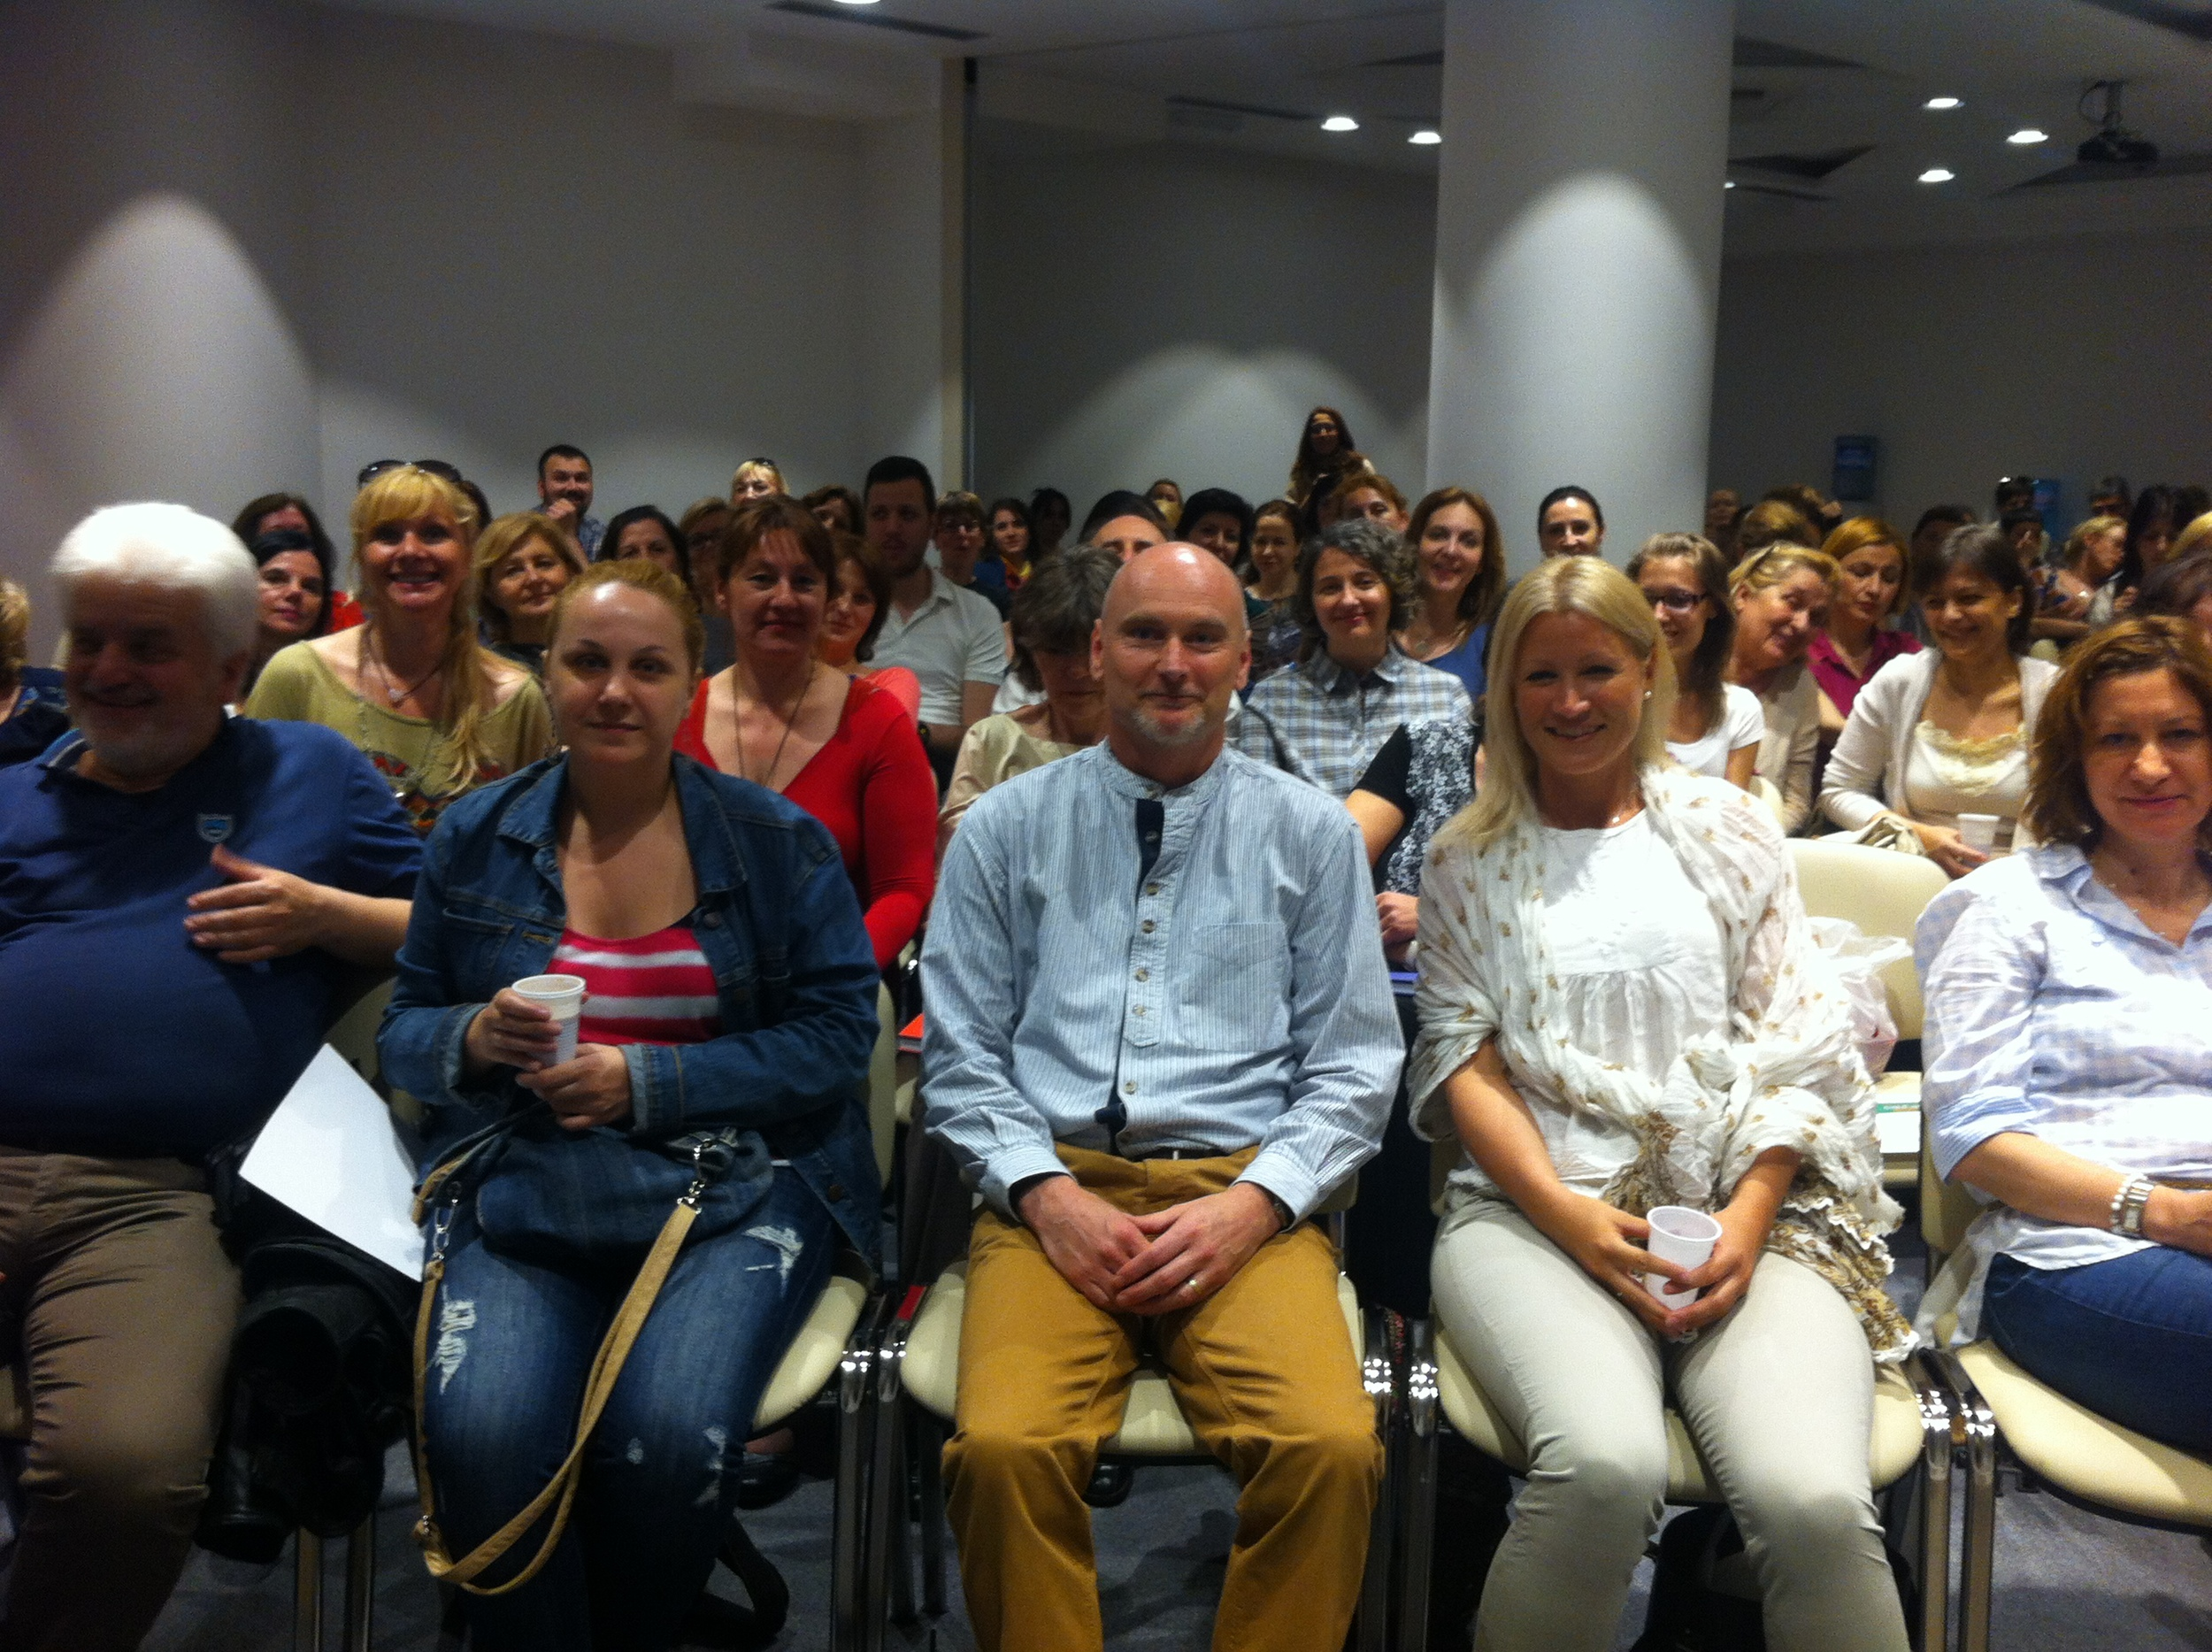 Ian Watson with students in belgrade, serbia in 2014